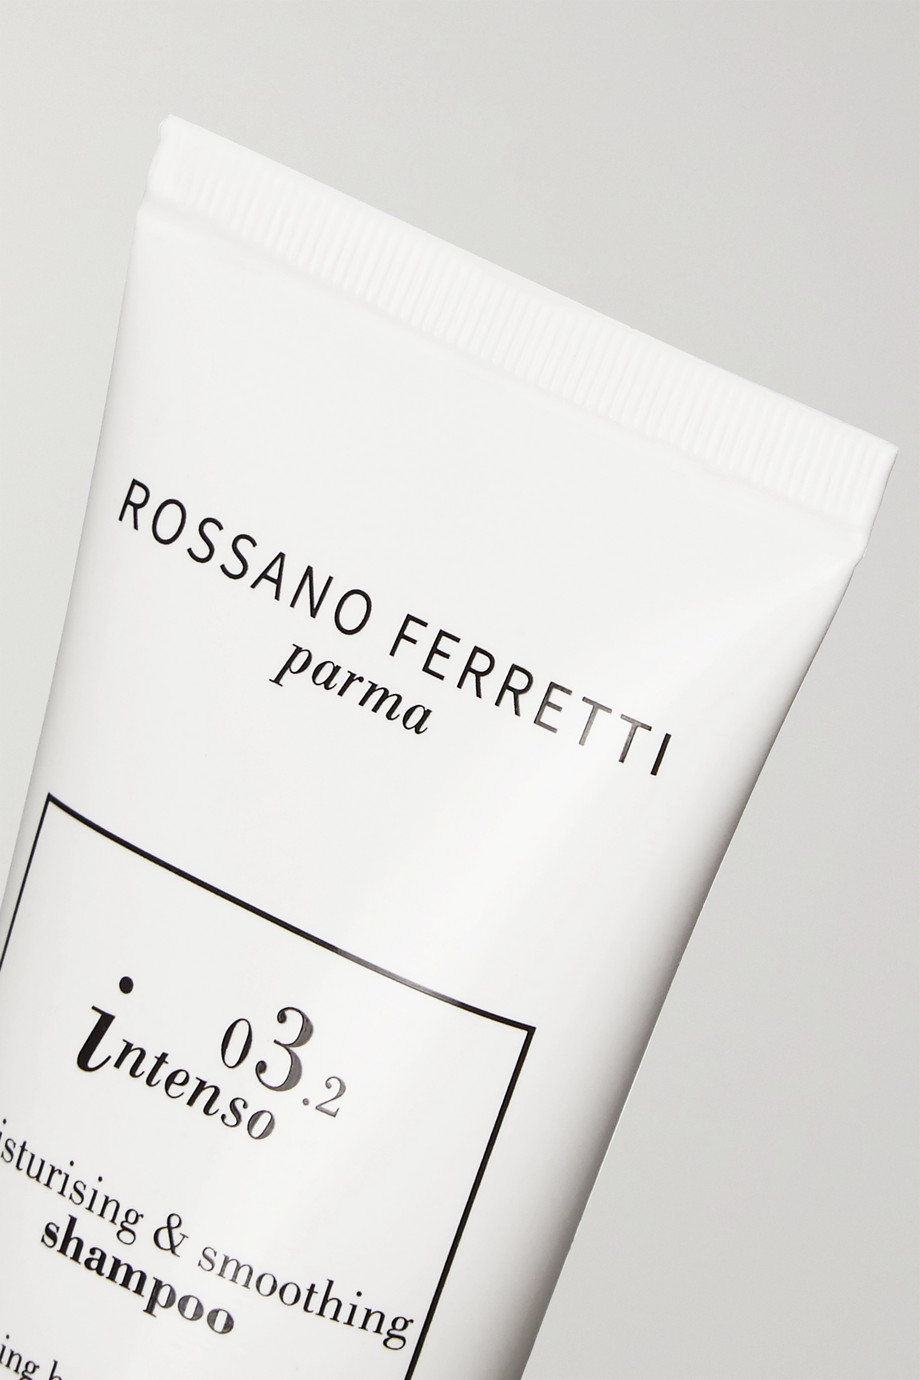 ROSSANO FERRETTI Parma Intenso Moisturizing and Smoothing Shampoo, 50 ml – Shampoo